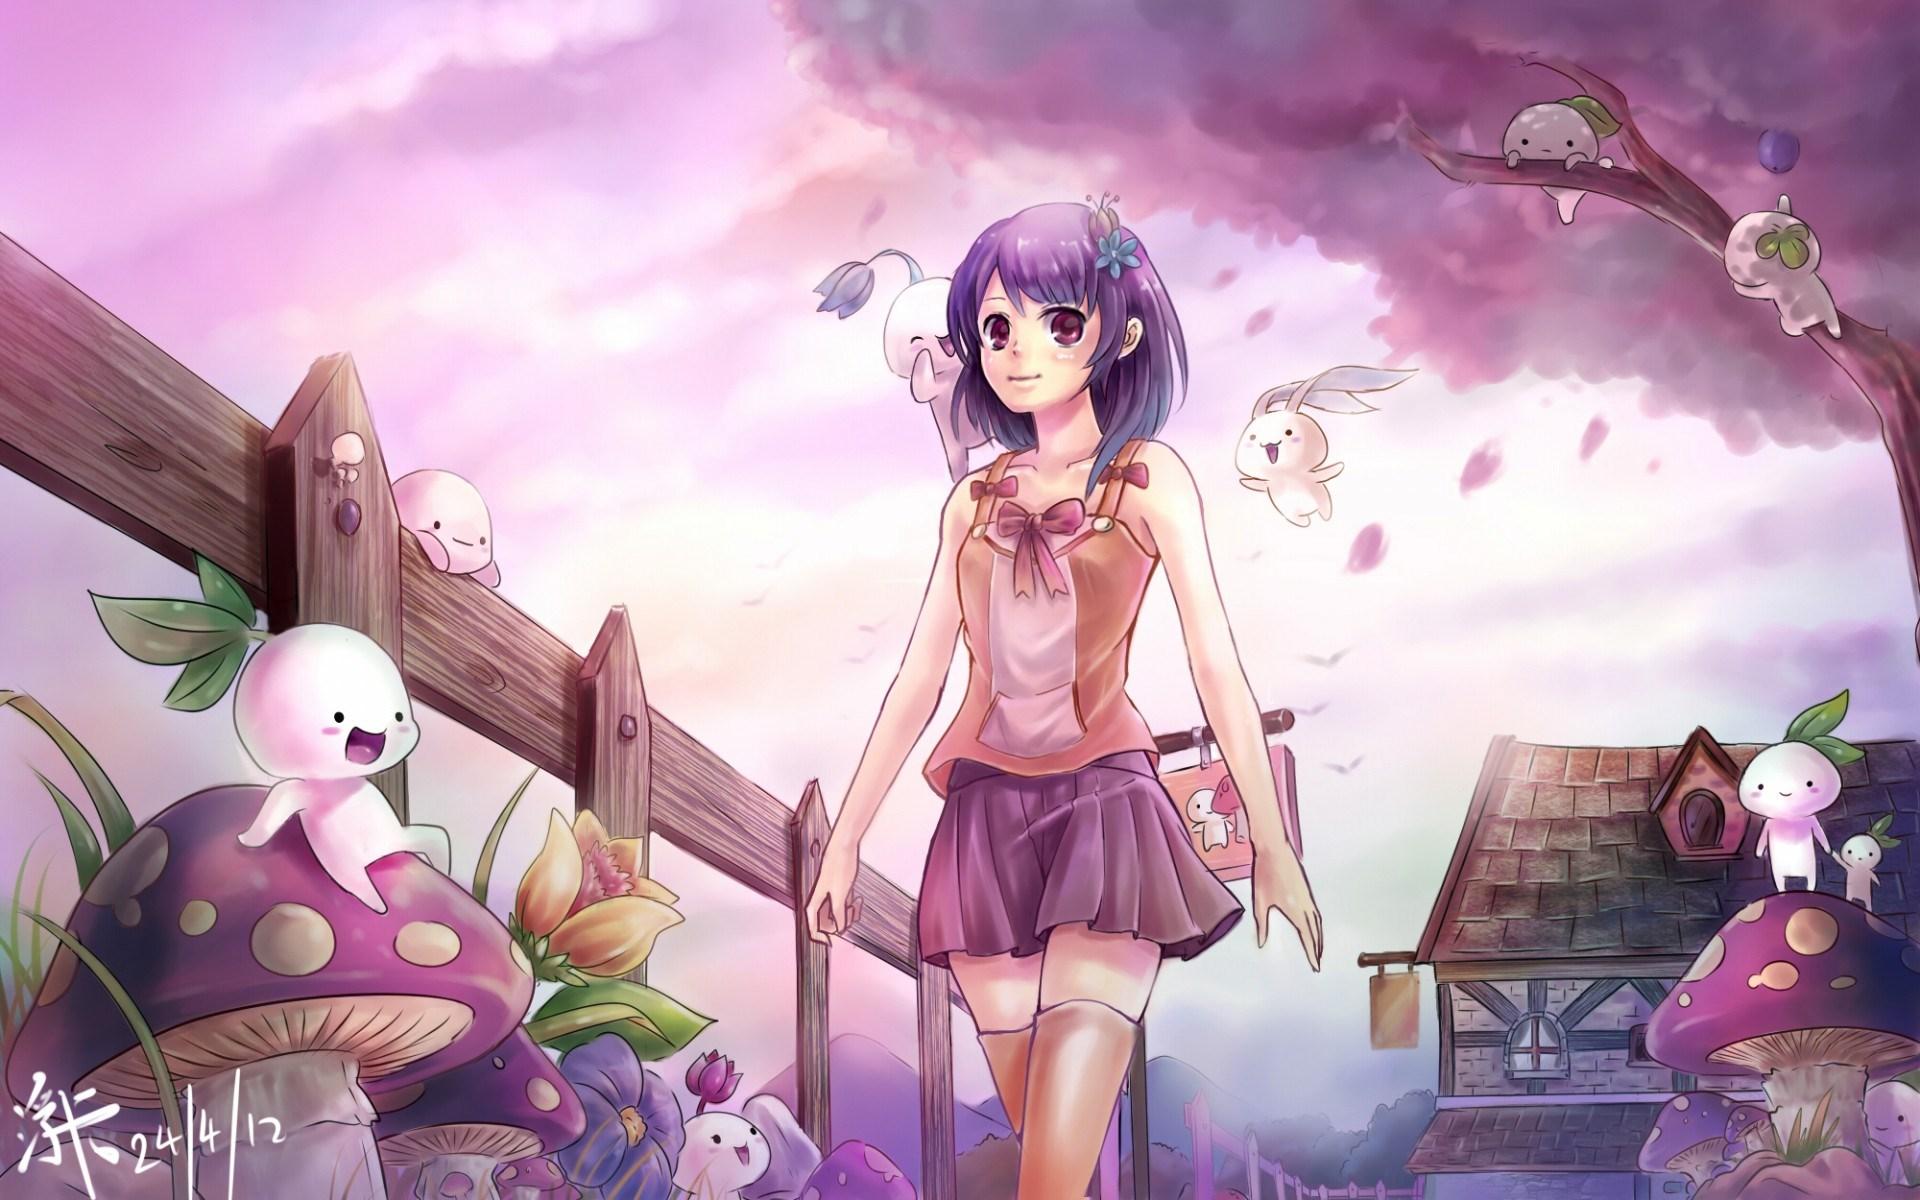 manga anime cute purple girl bunny mushrooms hd wallpaper 1920x1200